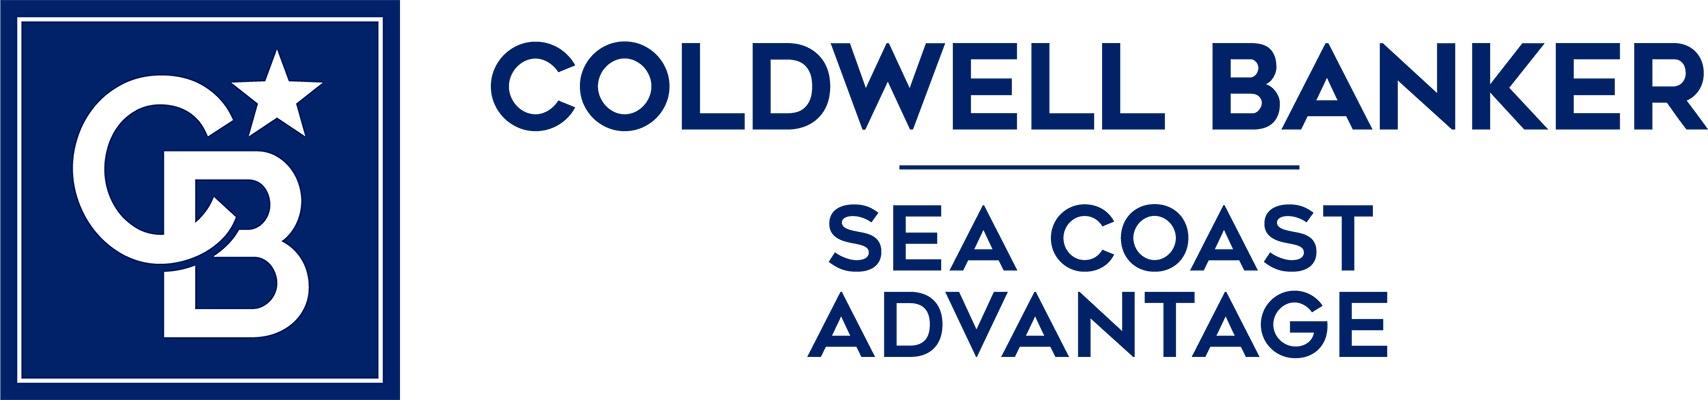 Abby Ashley - Coldwell Banker Sea Coast Advantage Realty Logo